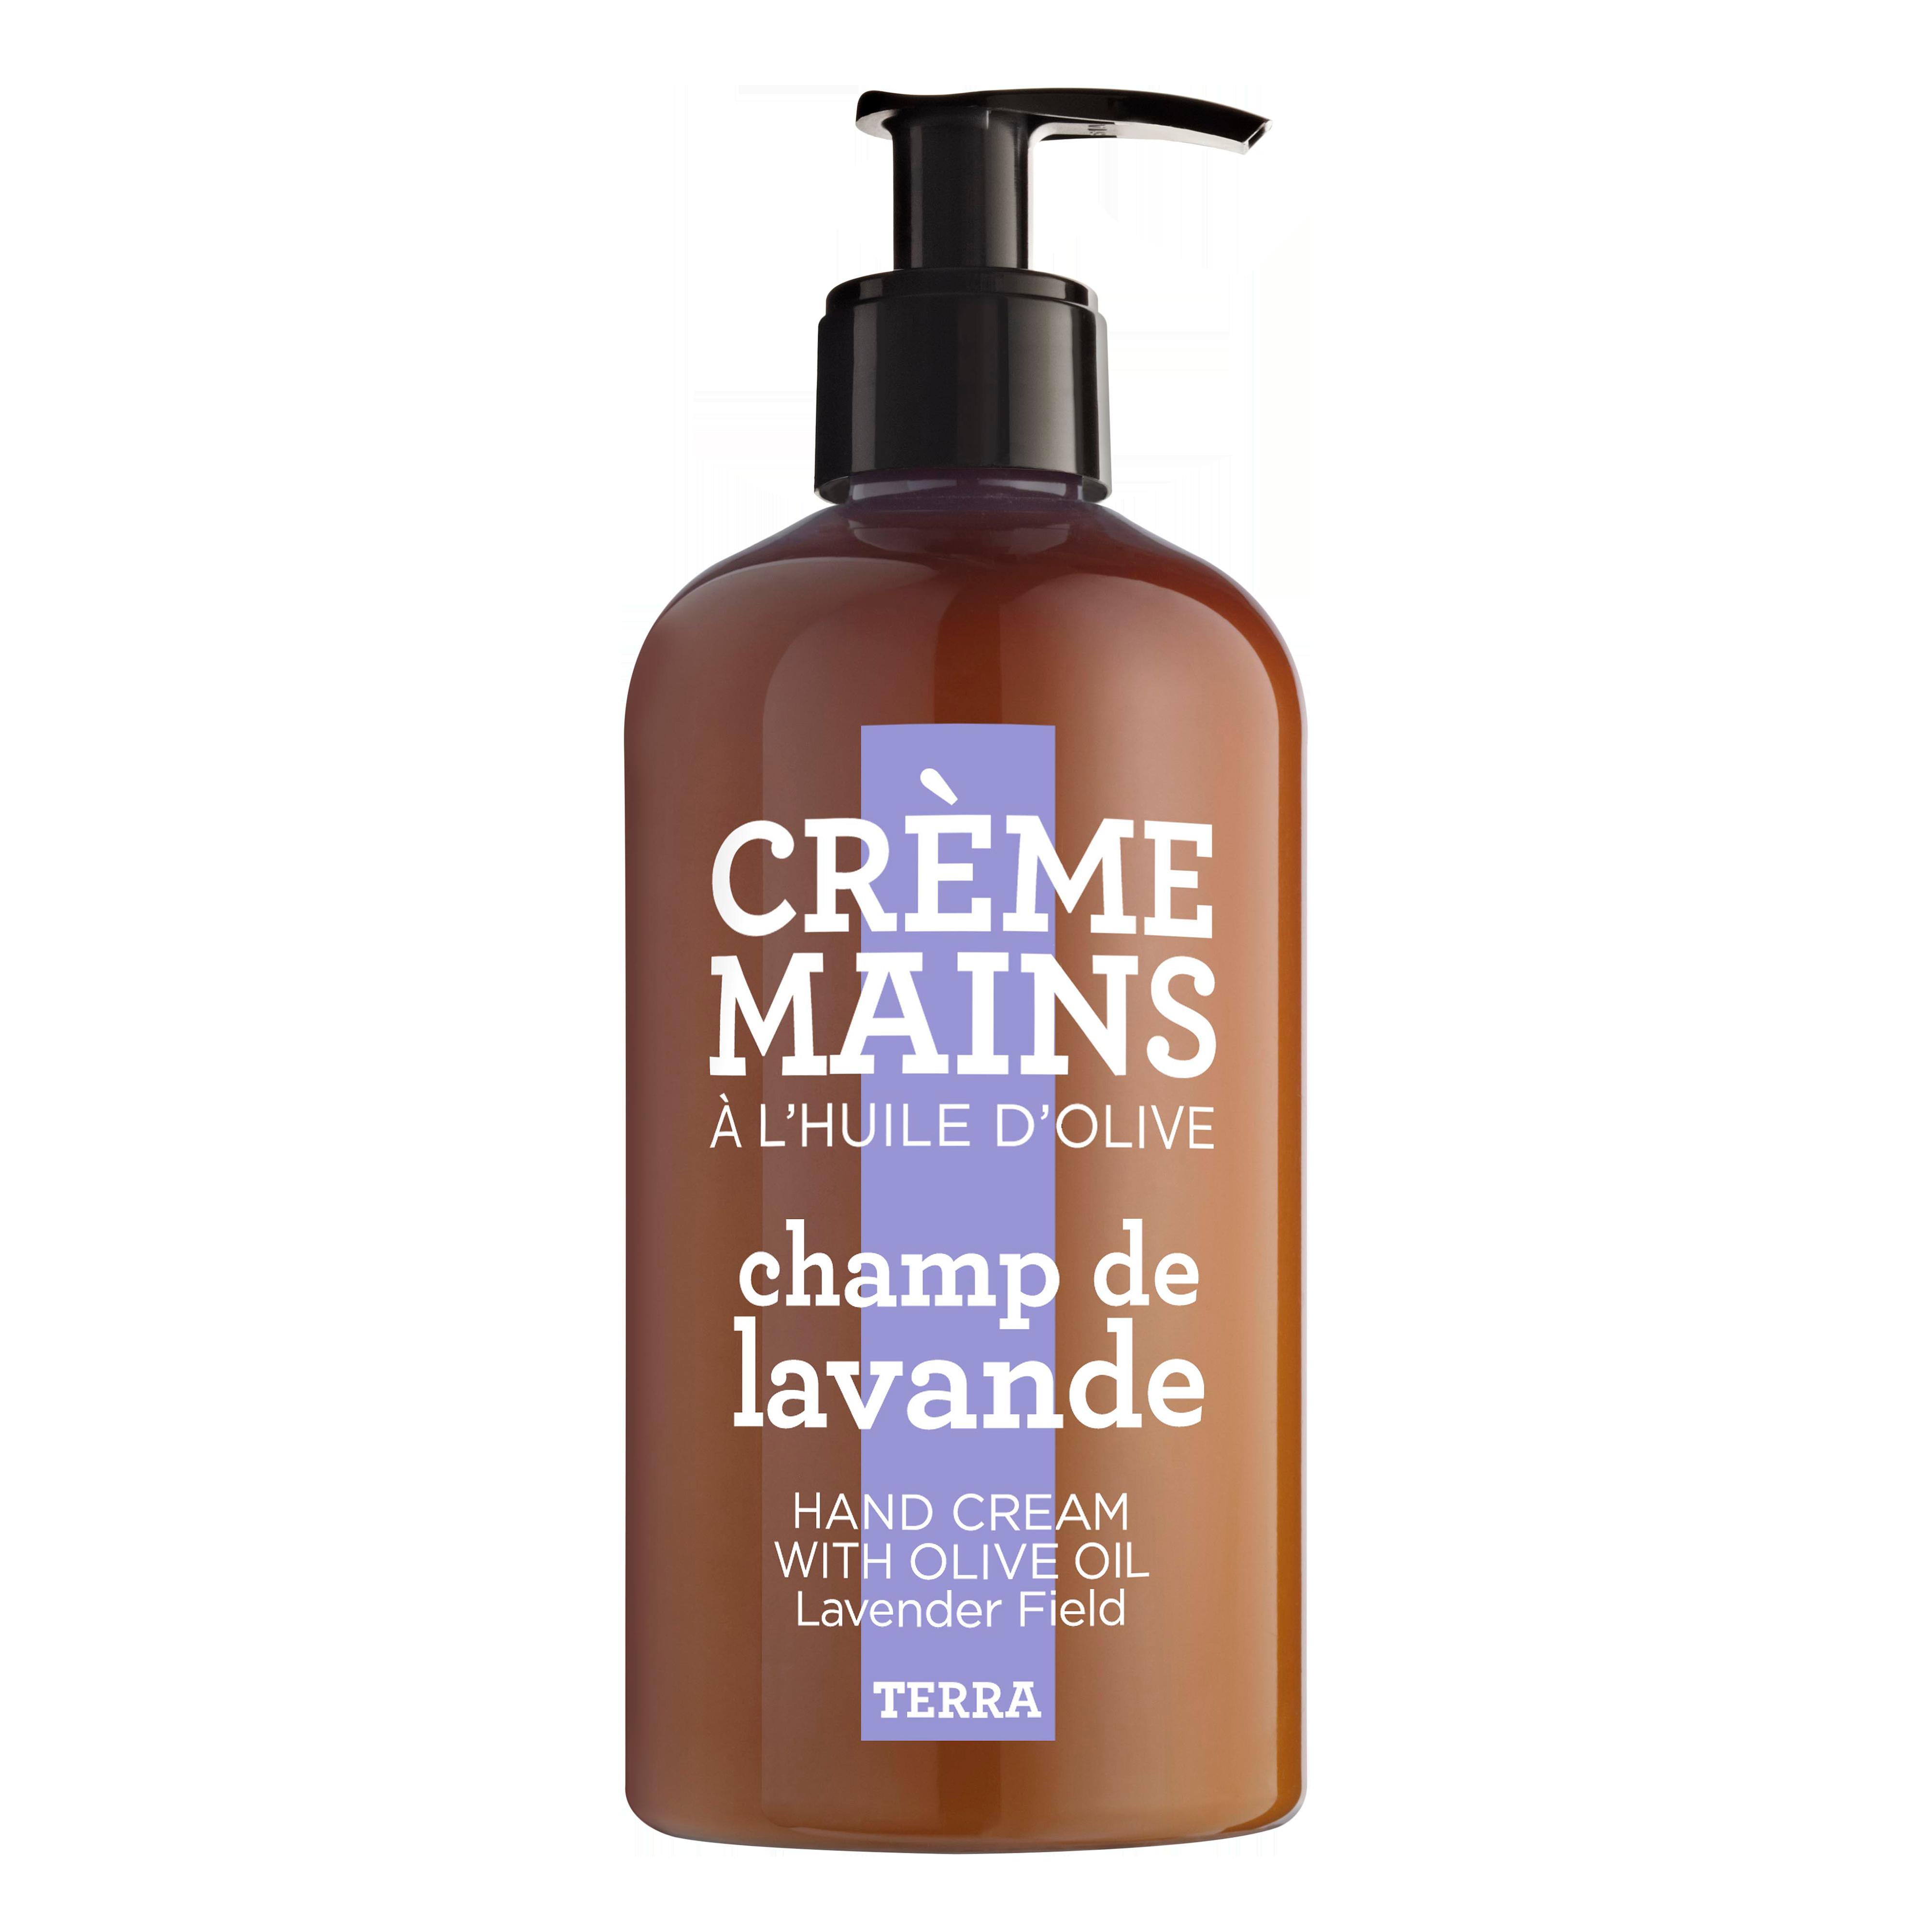 Lavender Field Hand Cream